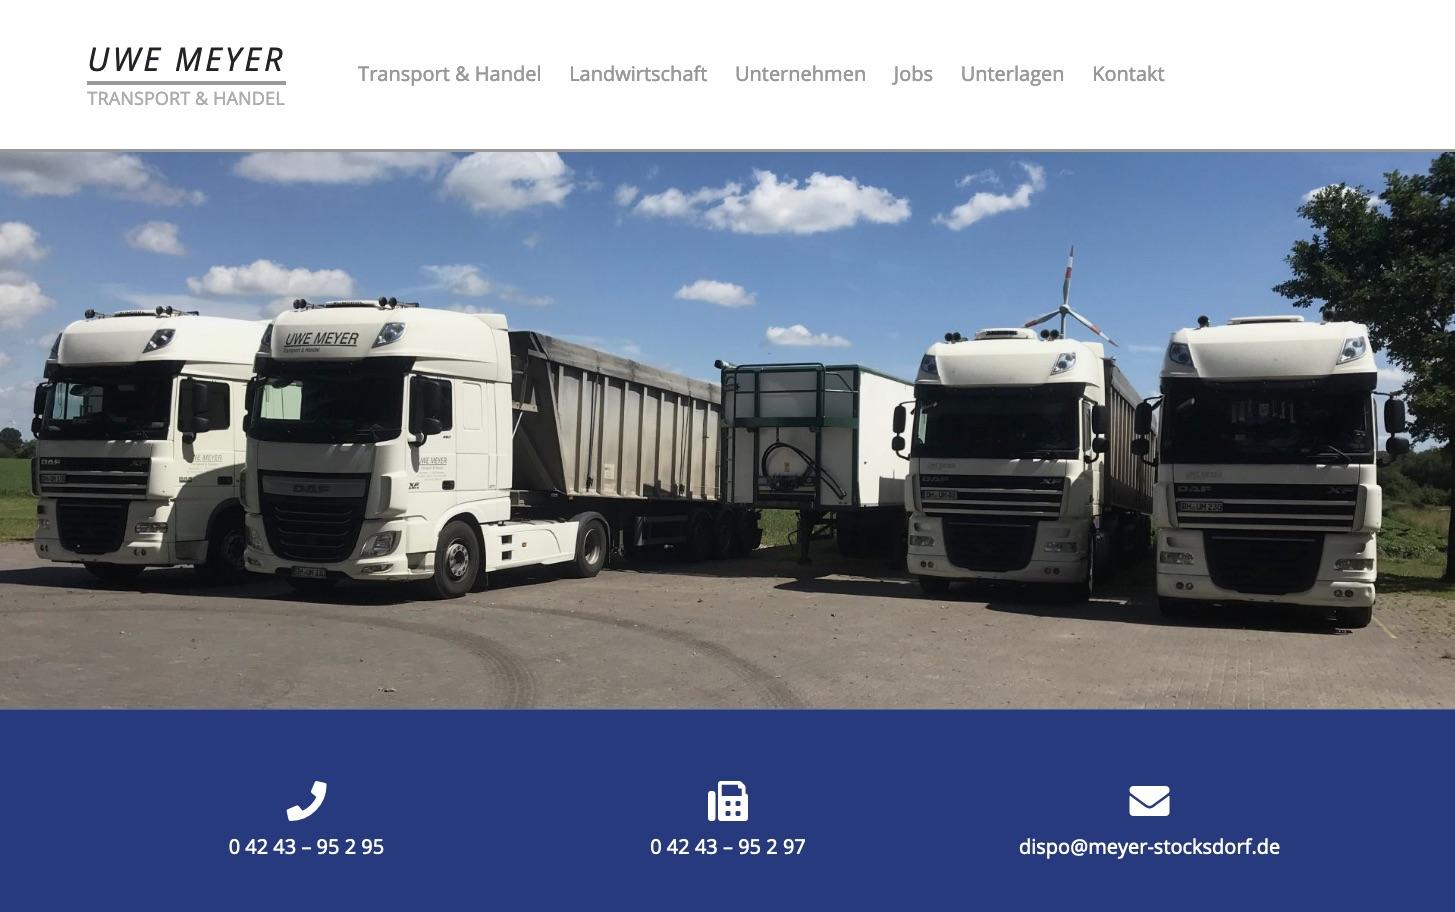 Uwe Meyer - Transport & Handel